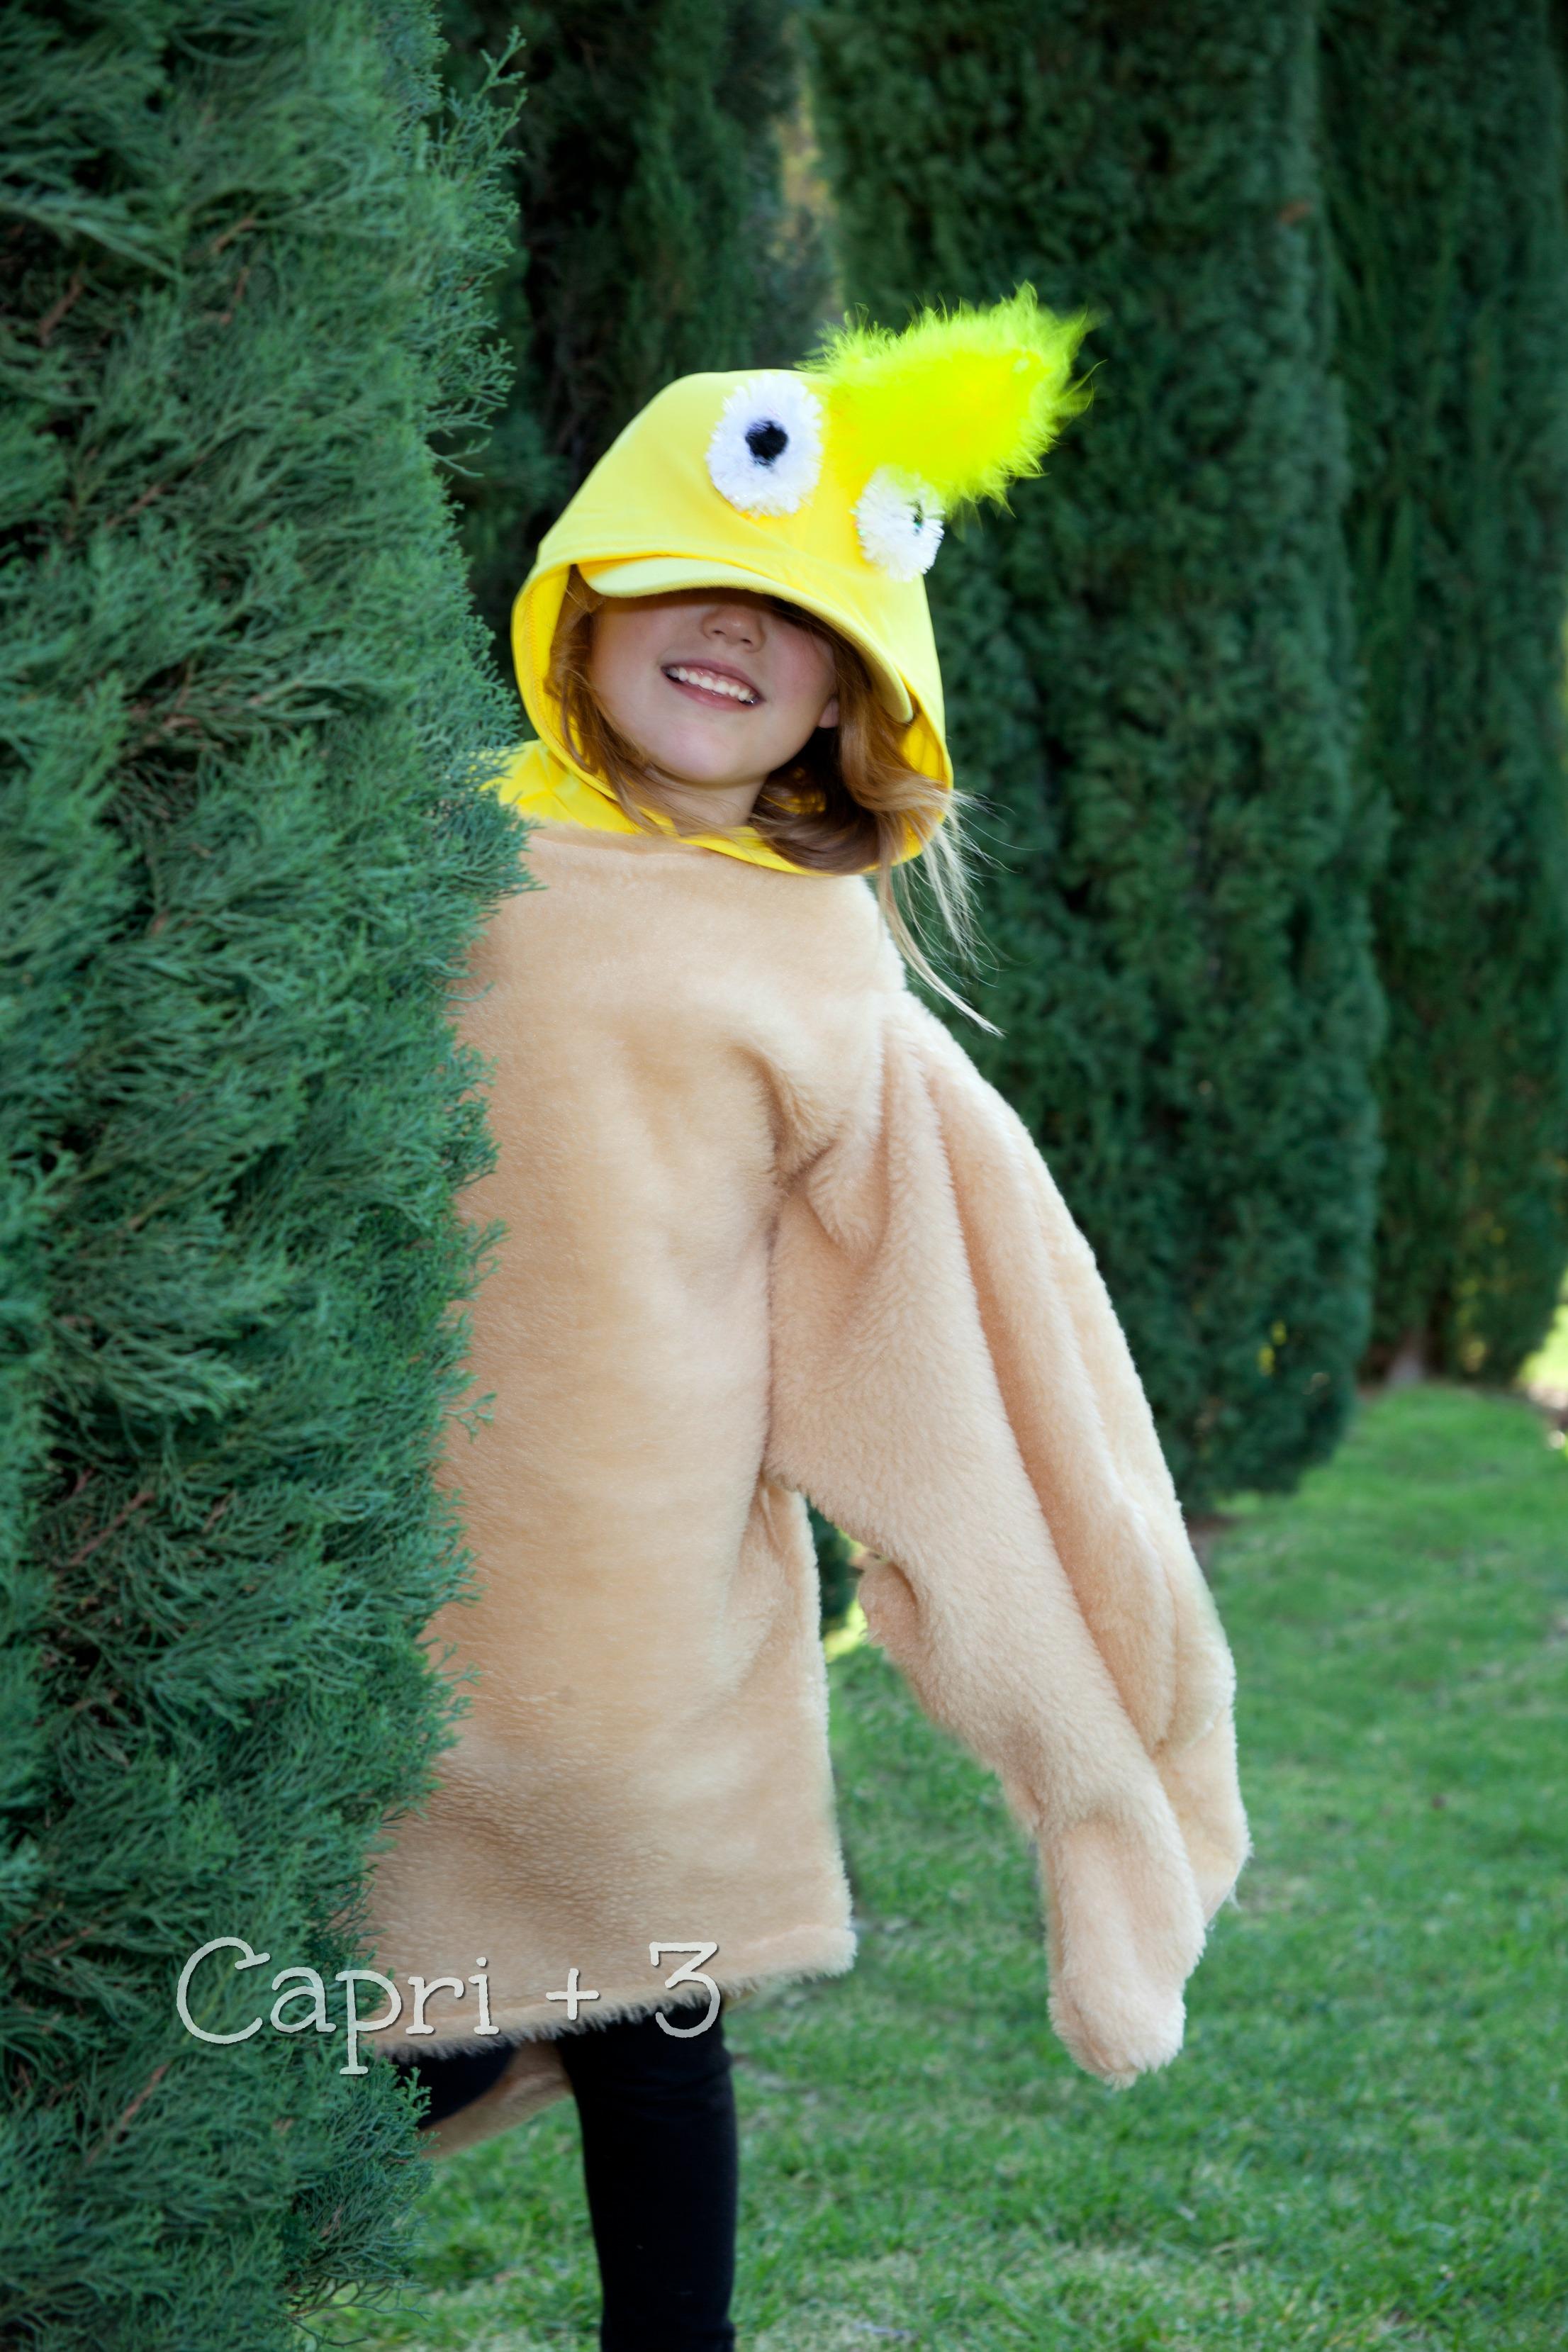 swomee-swan-themed-costume-the-lorax